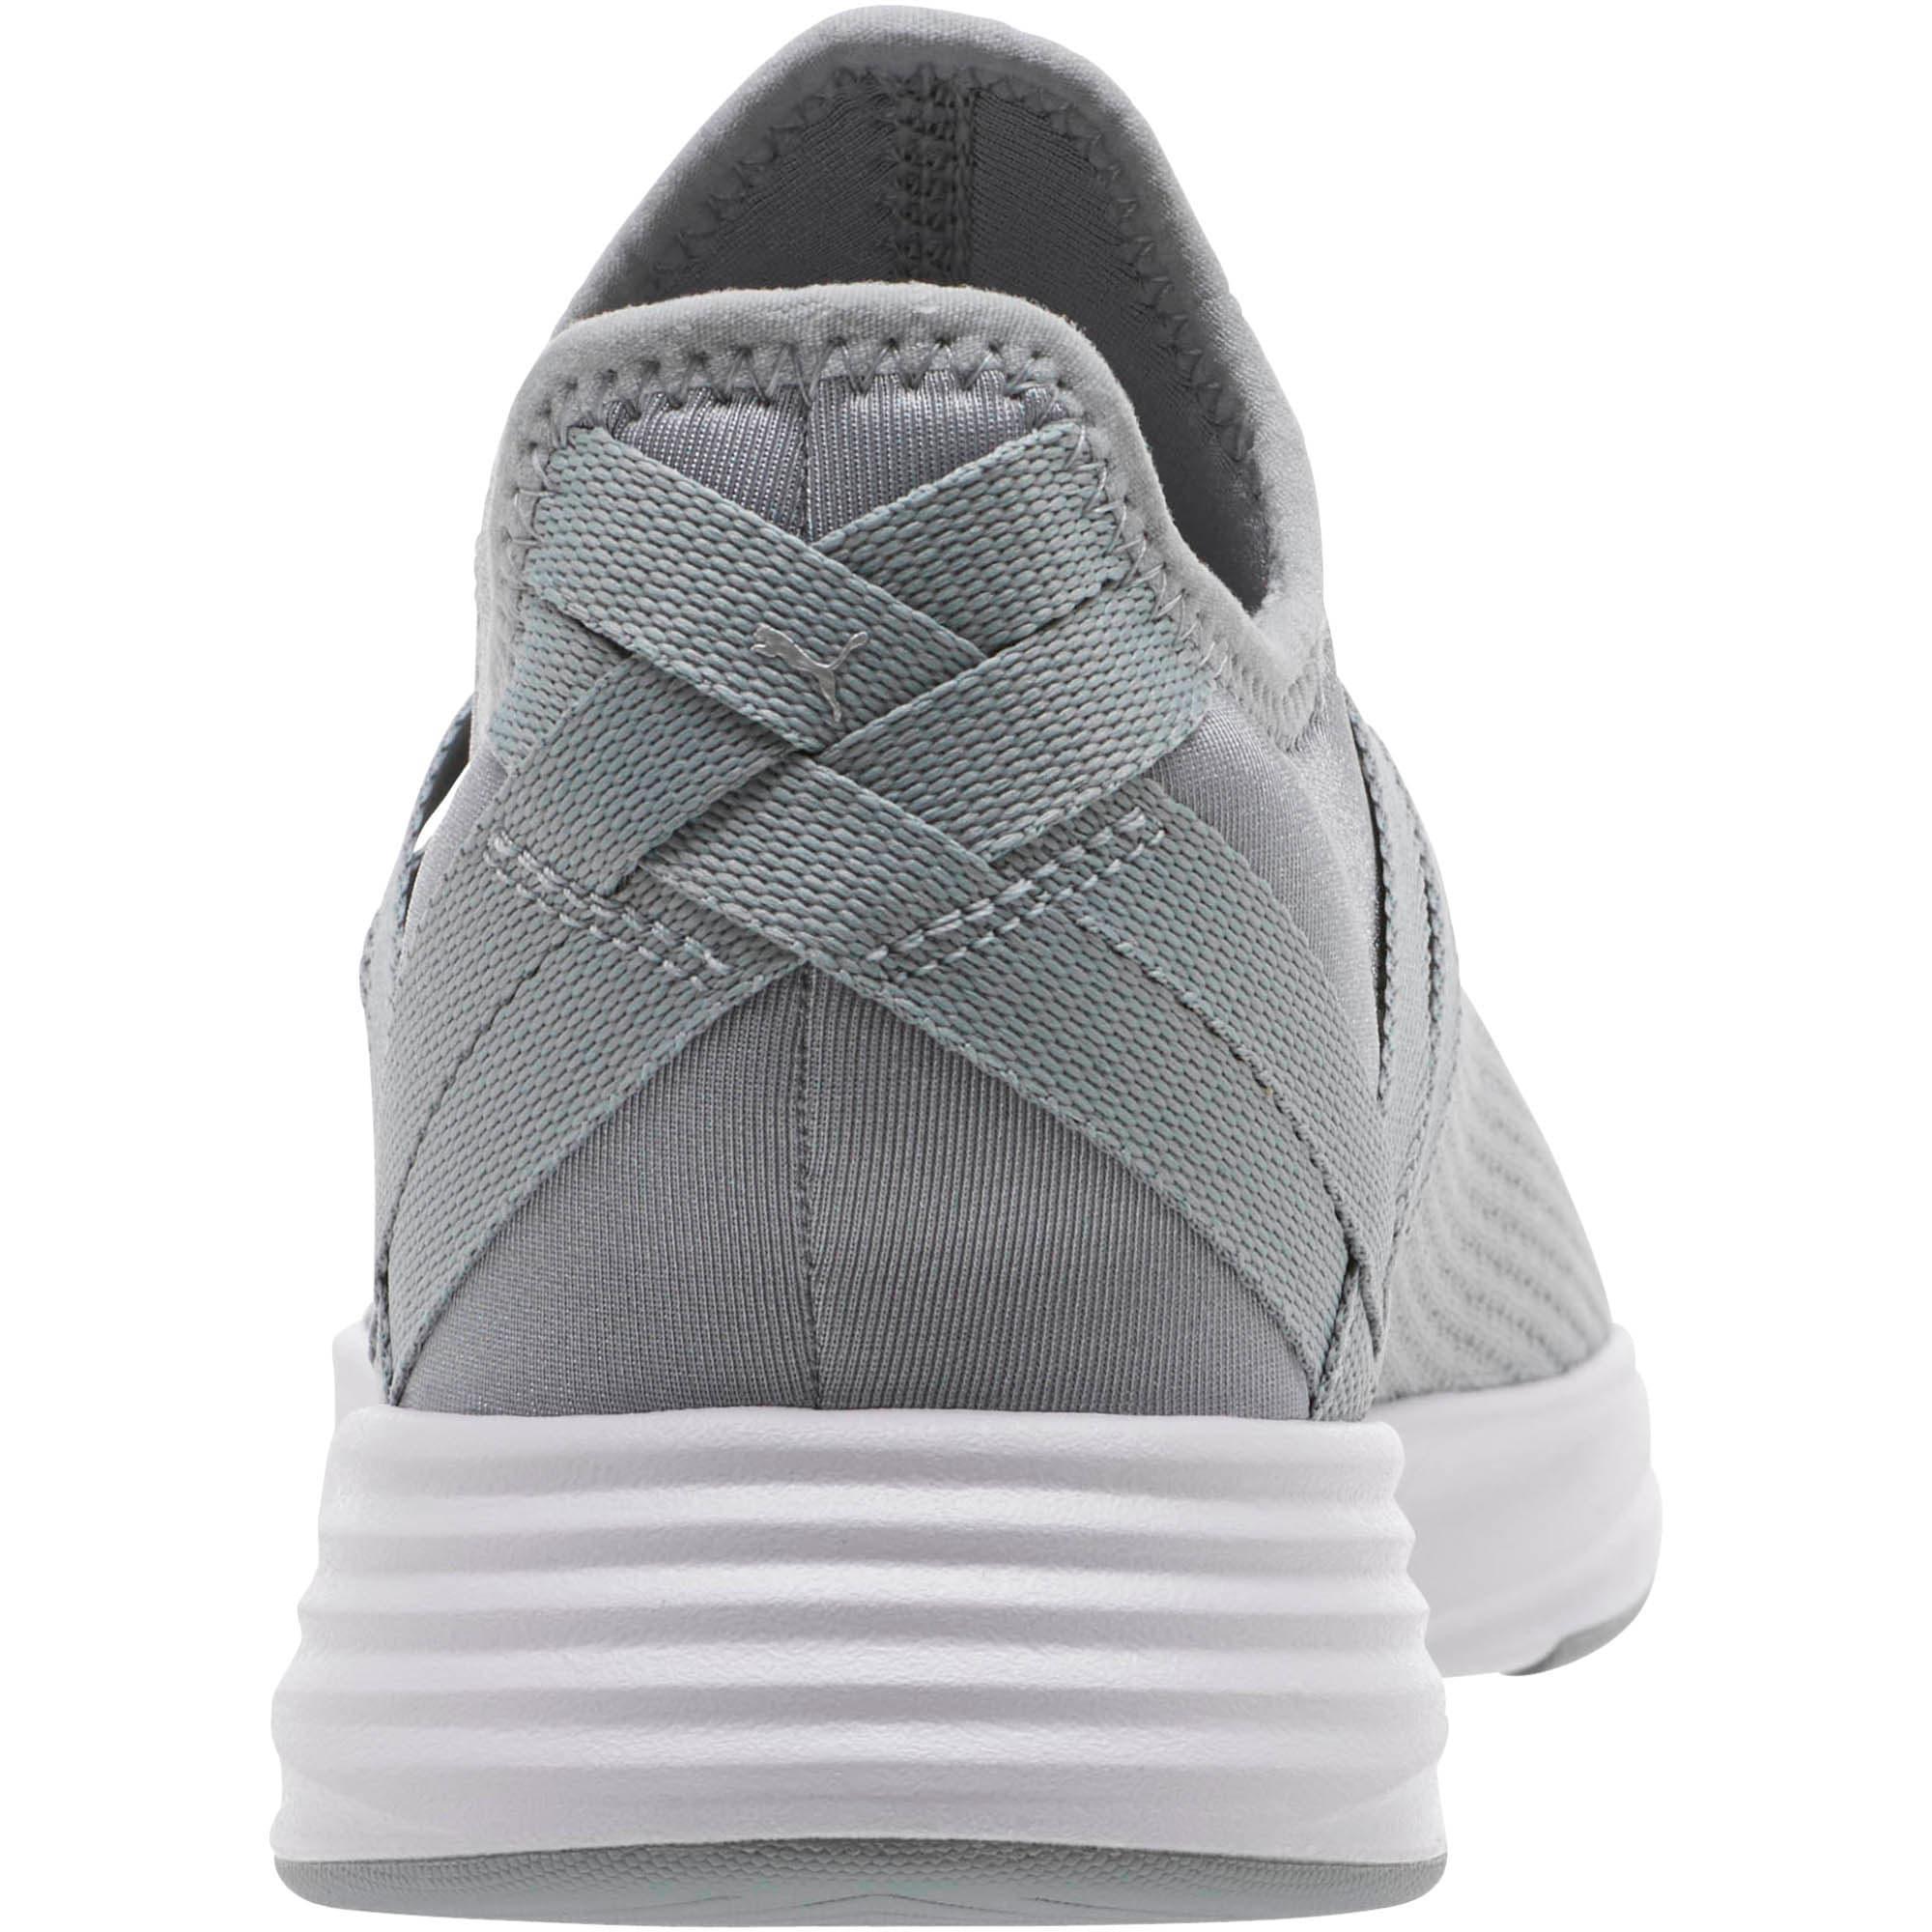 Thumbnail 4 of Radiate XT Slip-On Women's Sneakers, Quarry-Puma Silver, medium